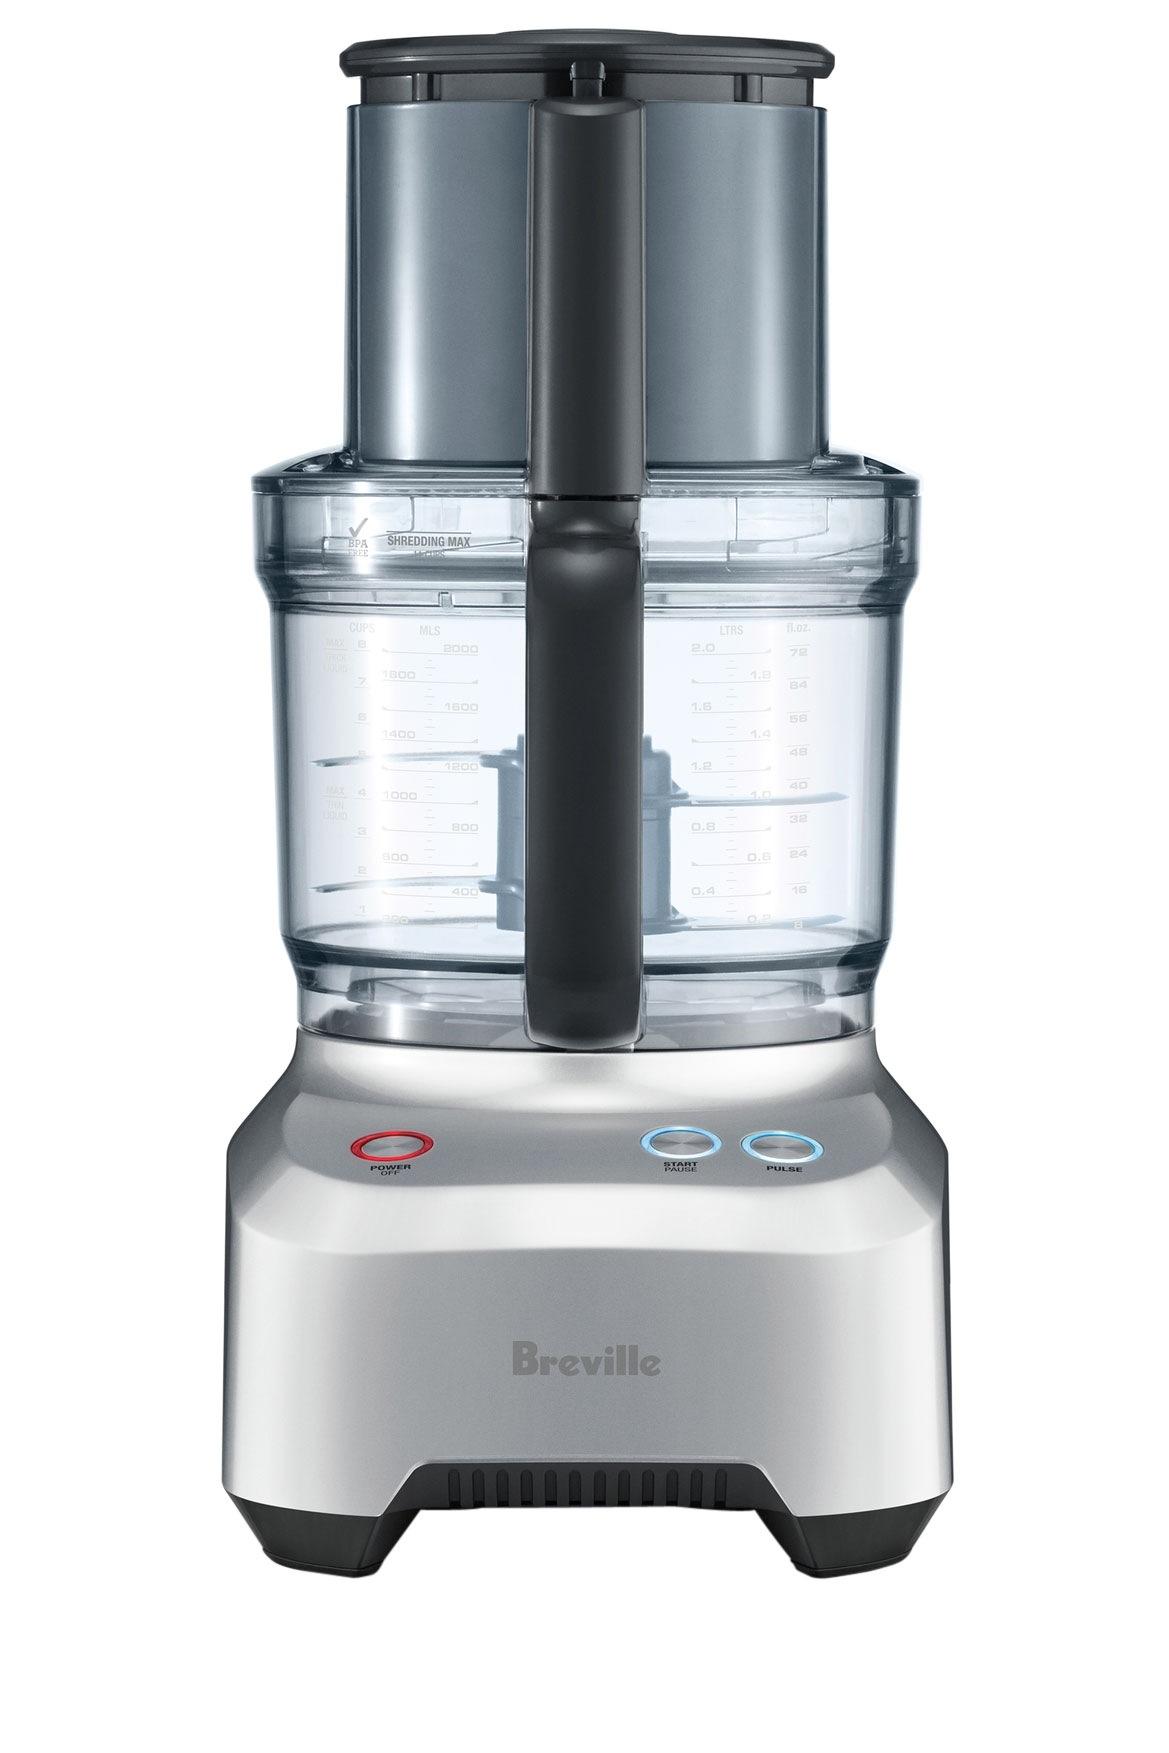 Breville Food Processor Motor Warranty